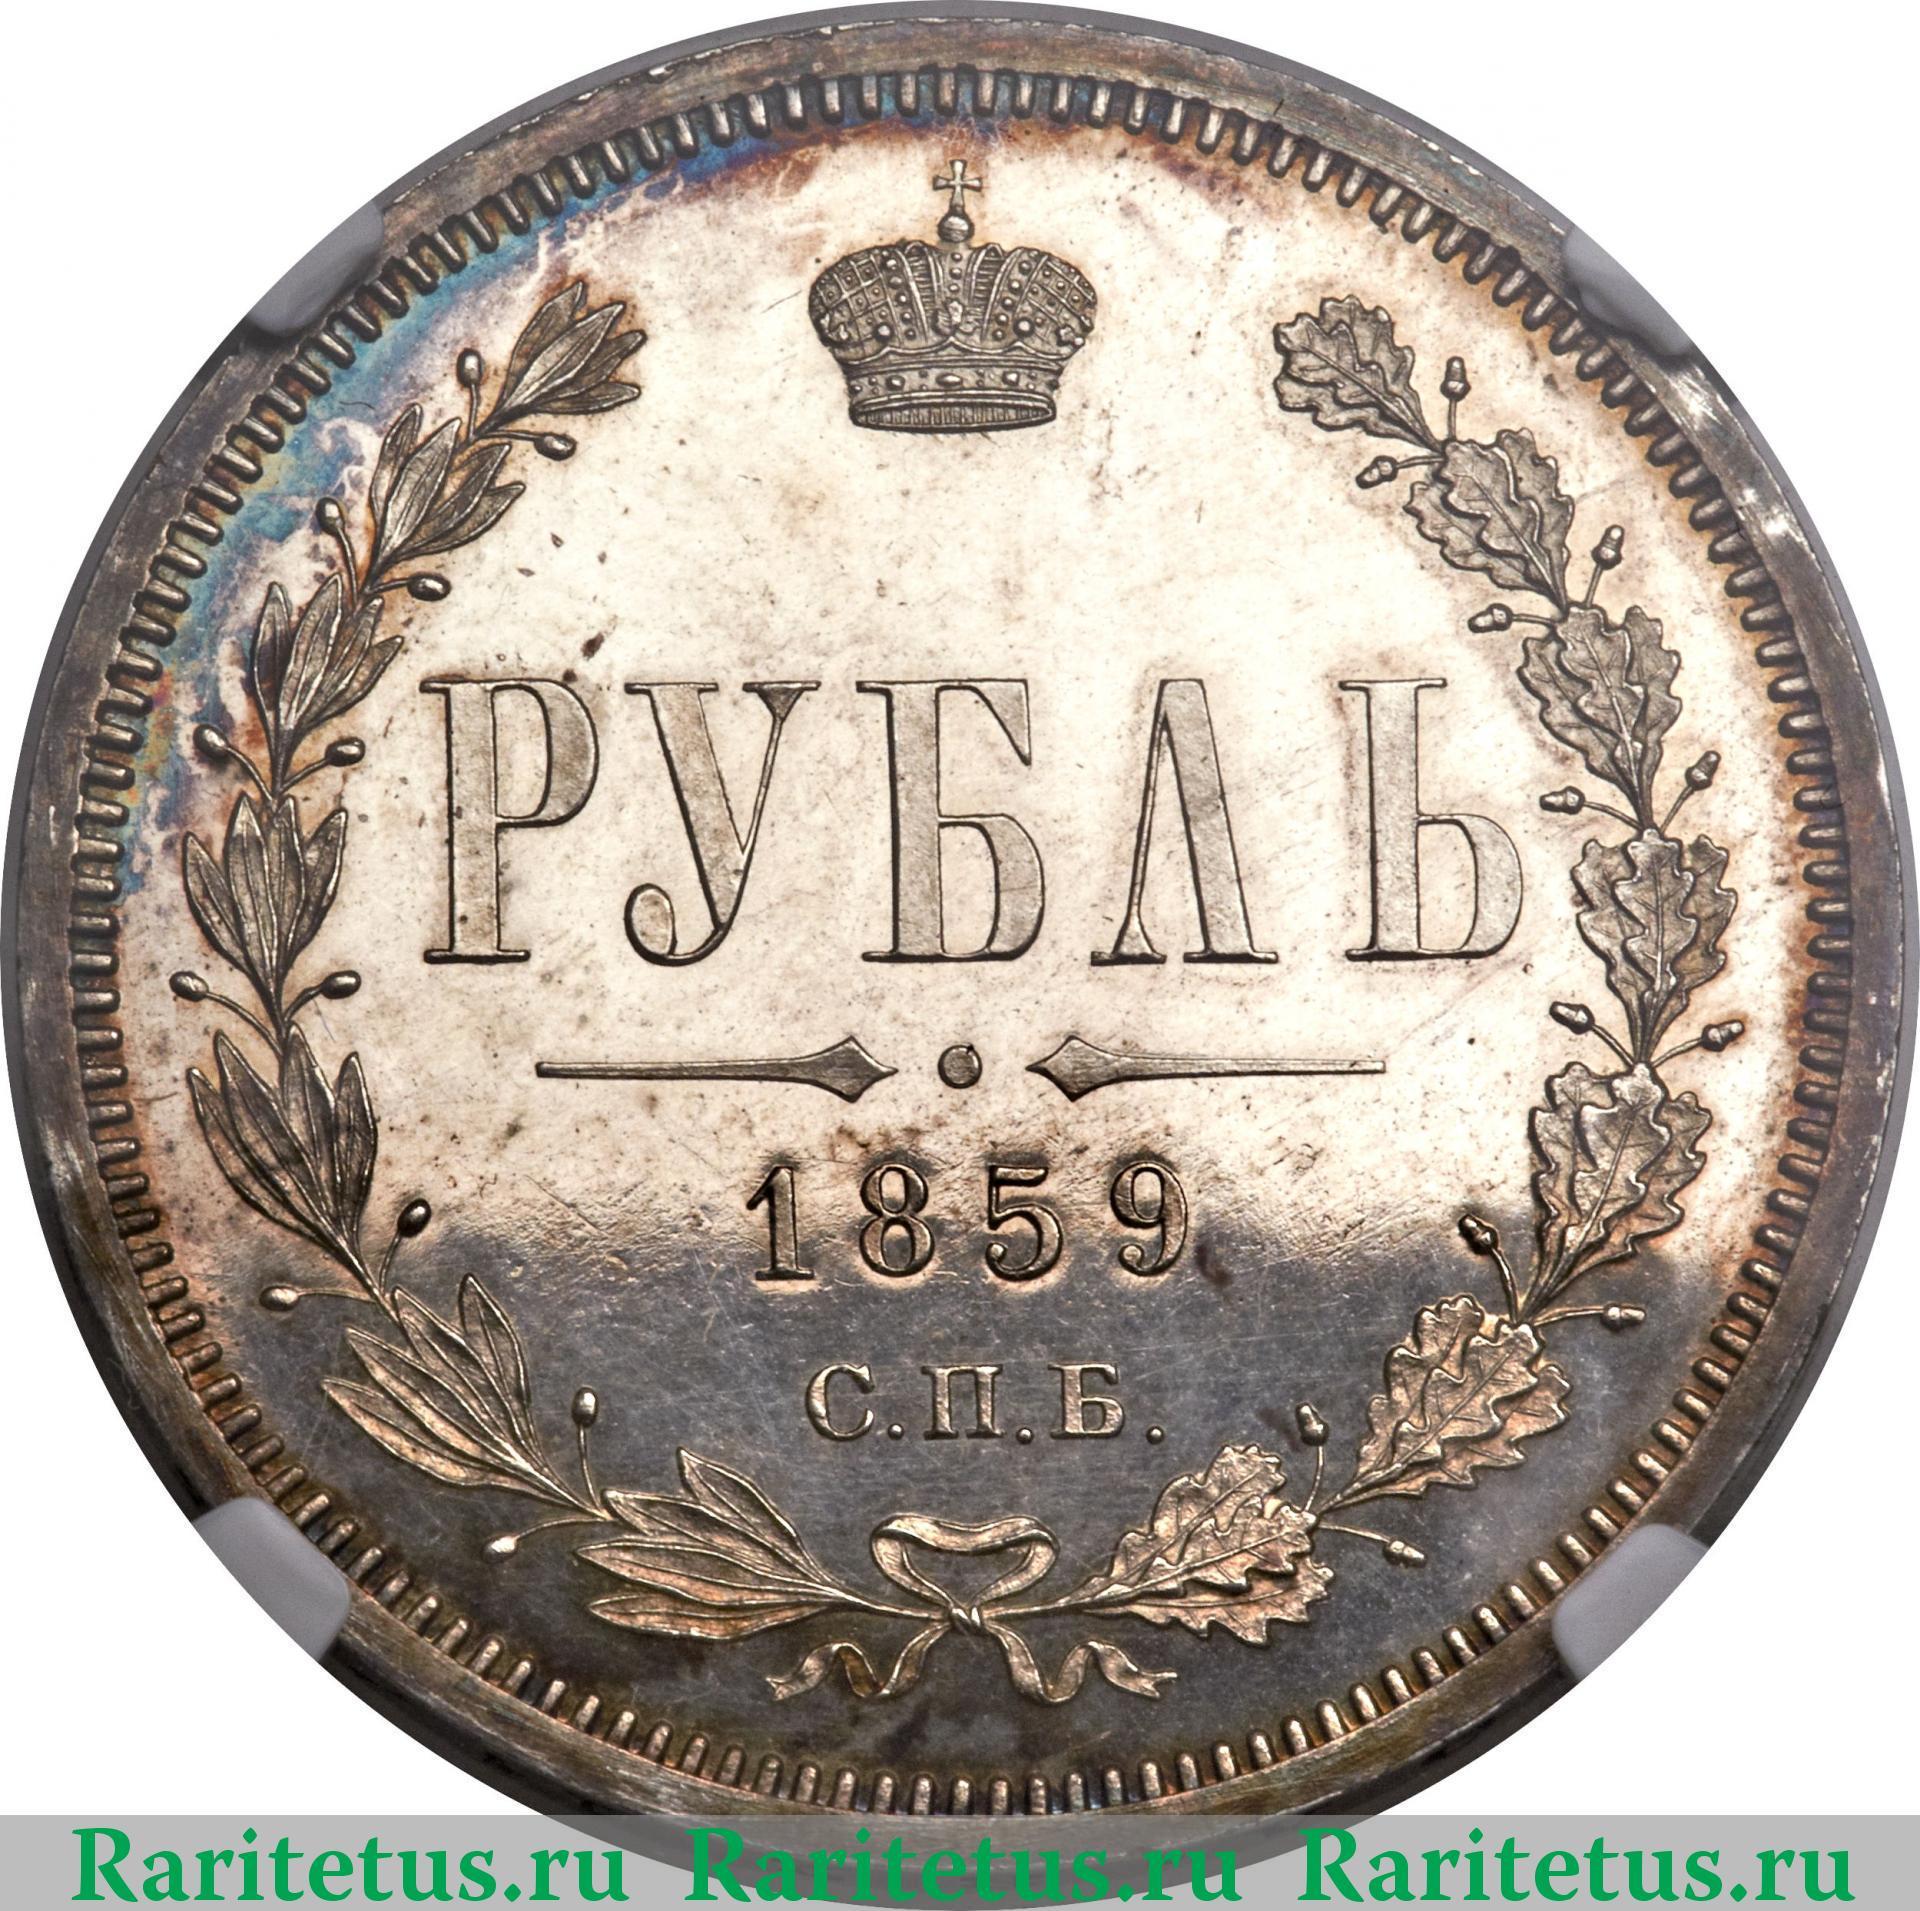 Рубль 1859 года цена 5 рублей ссср 1990 ереван цена